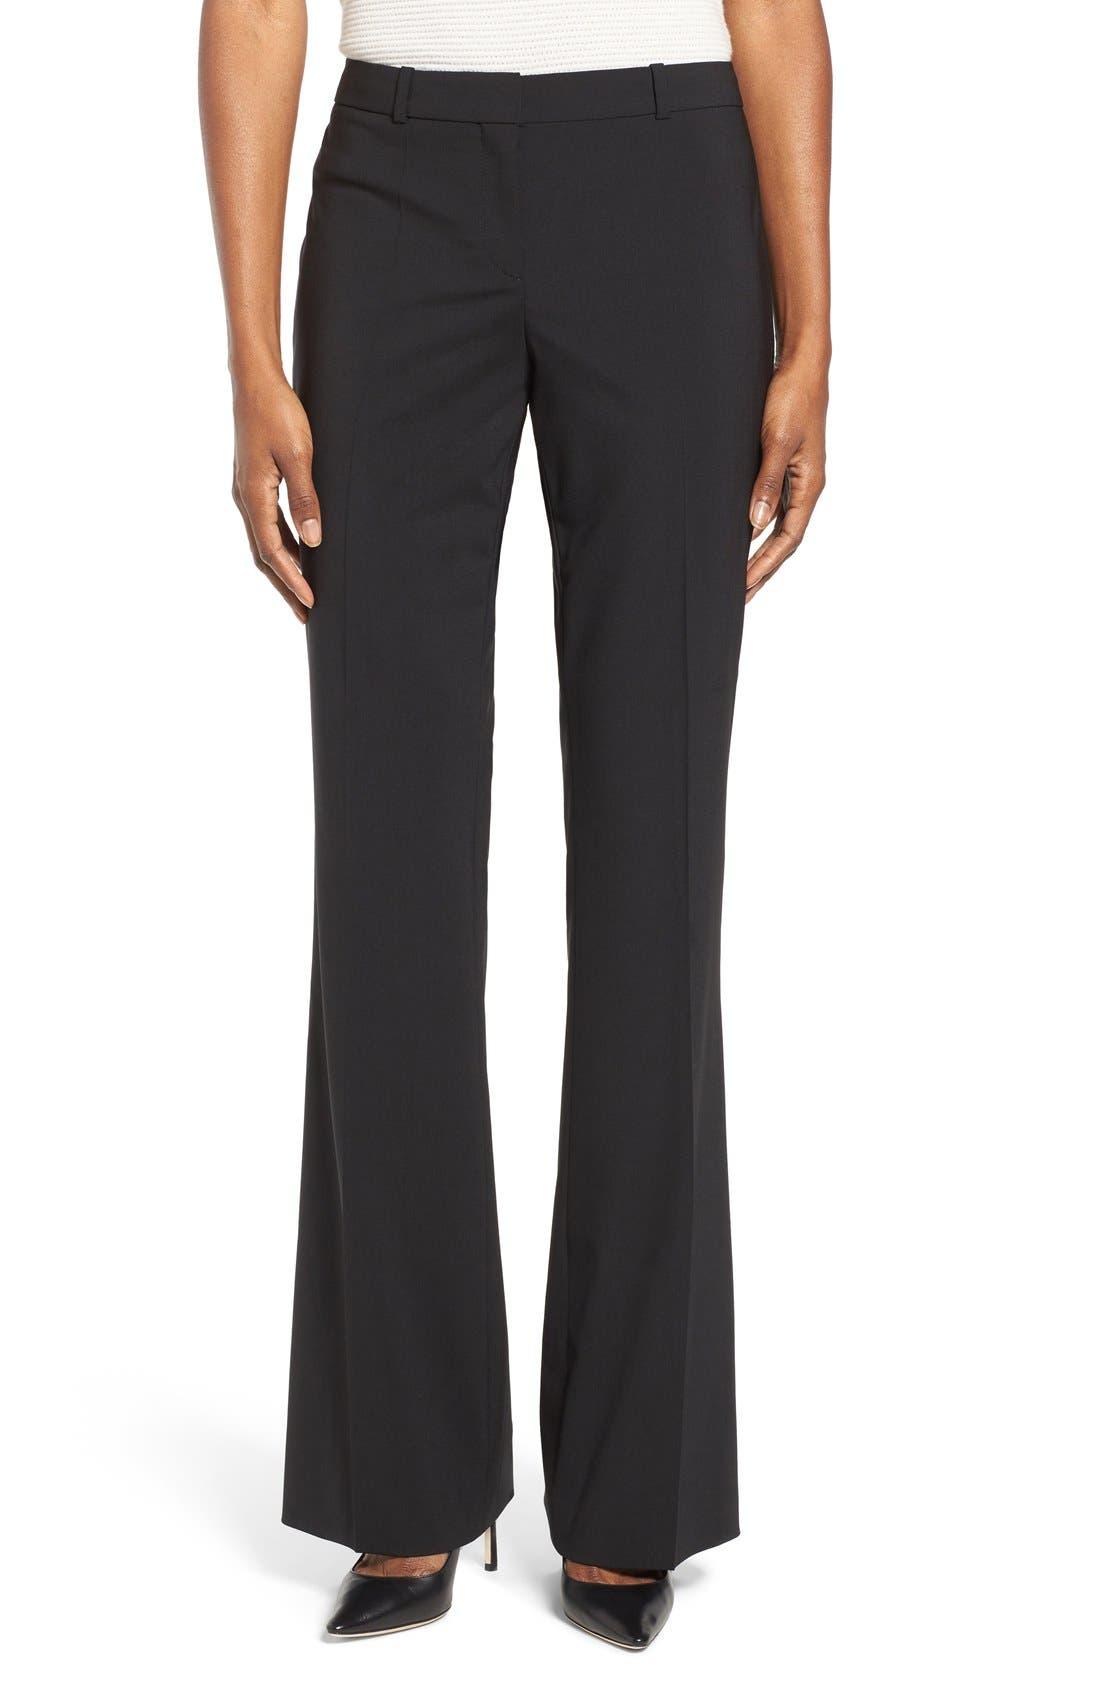 BOSS, Tulea3 Tropical Stretch Wool Trousers, Main thumbnail 1, color, BLACK